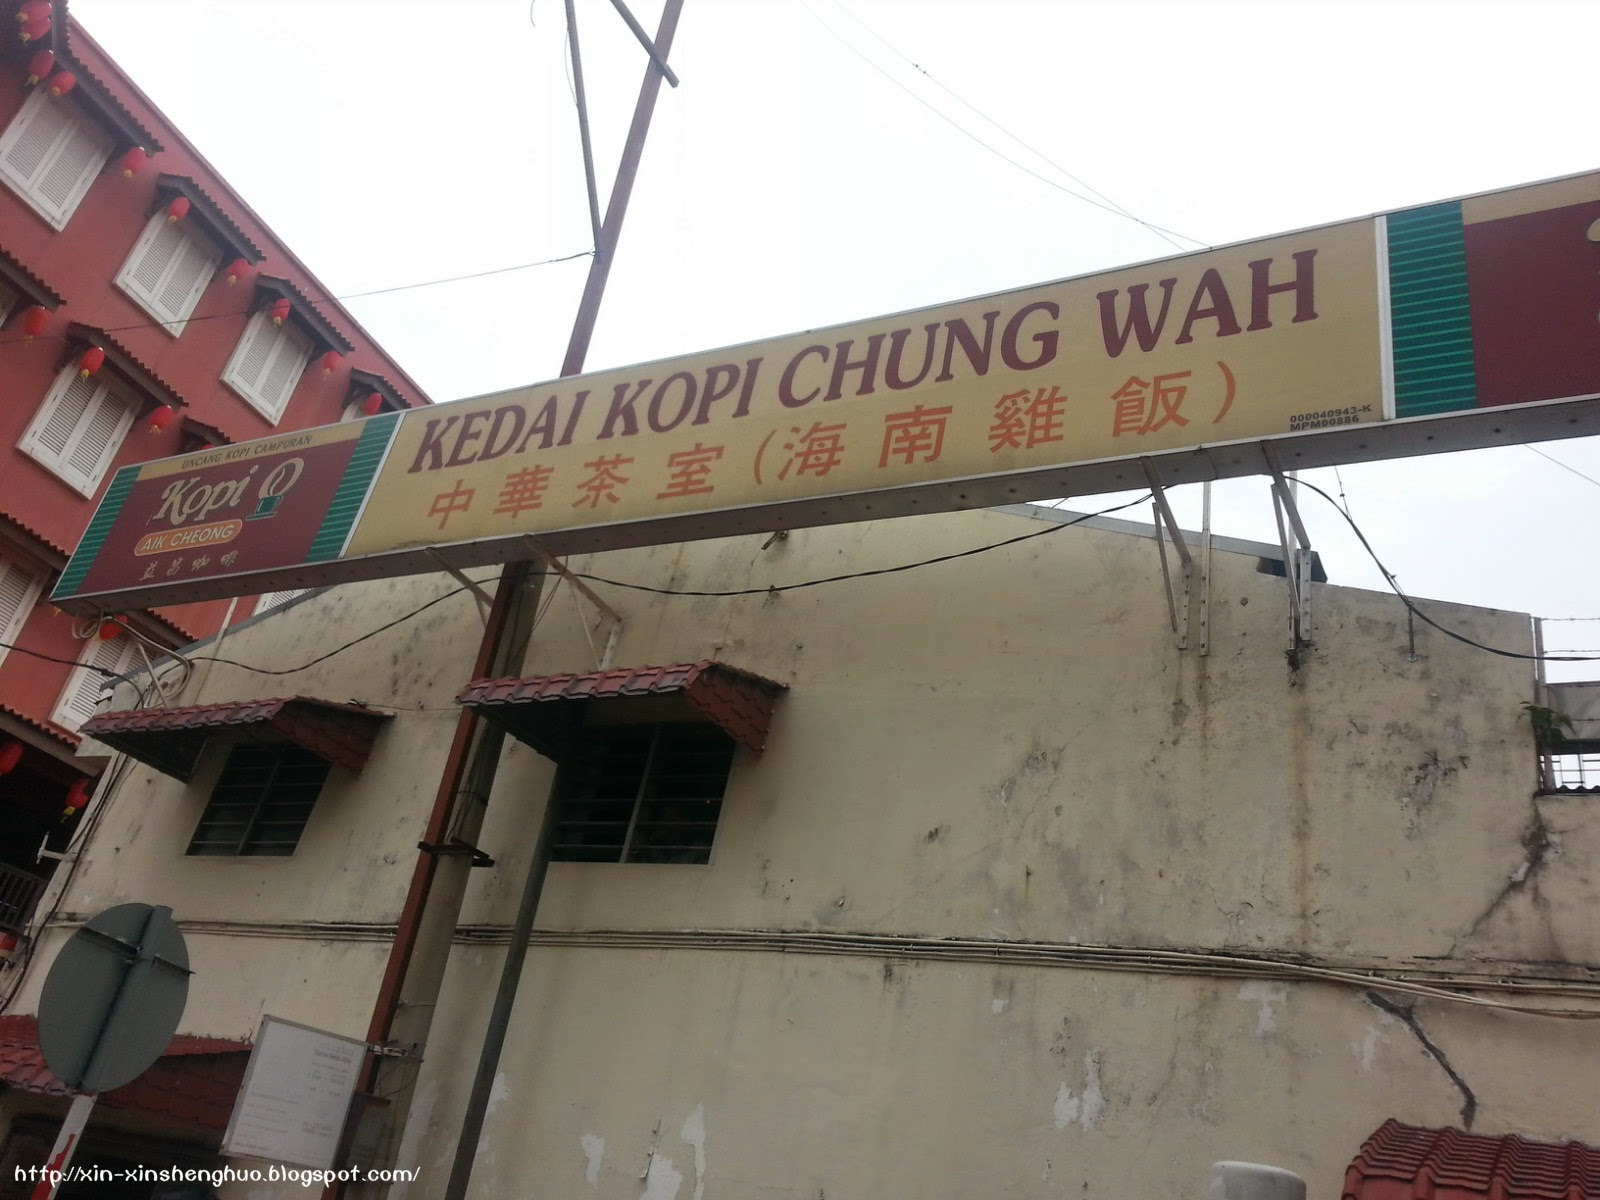 Kedai Kopi Chung Wah 中华茶室 (海南鸡饭)